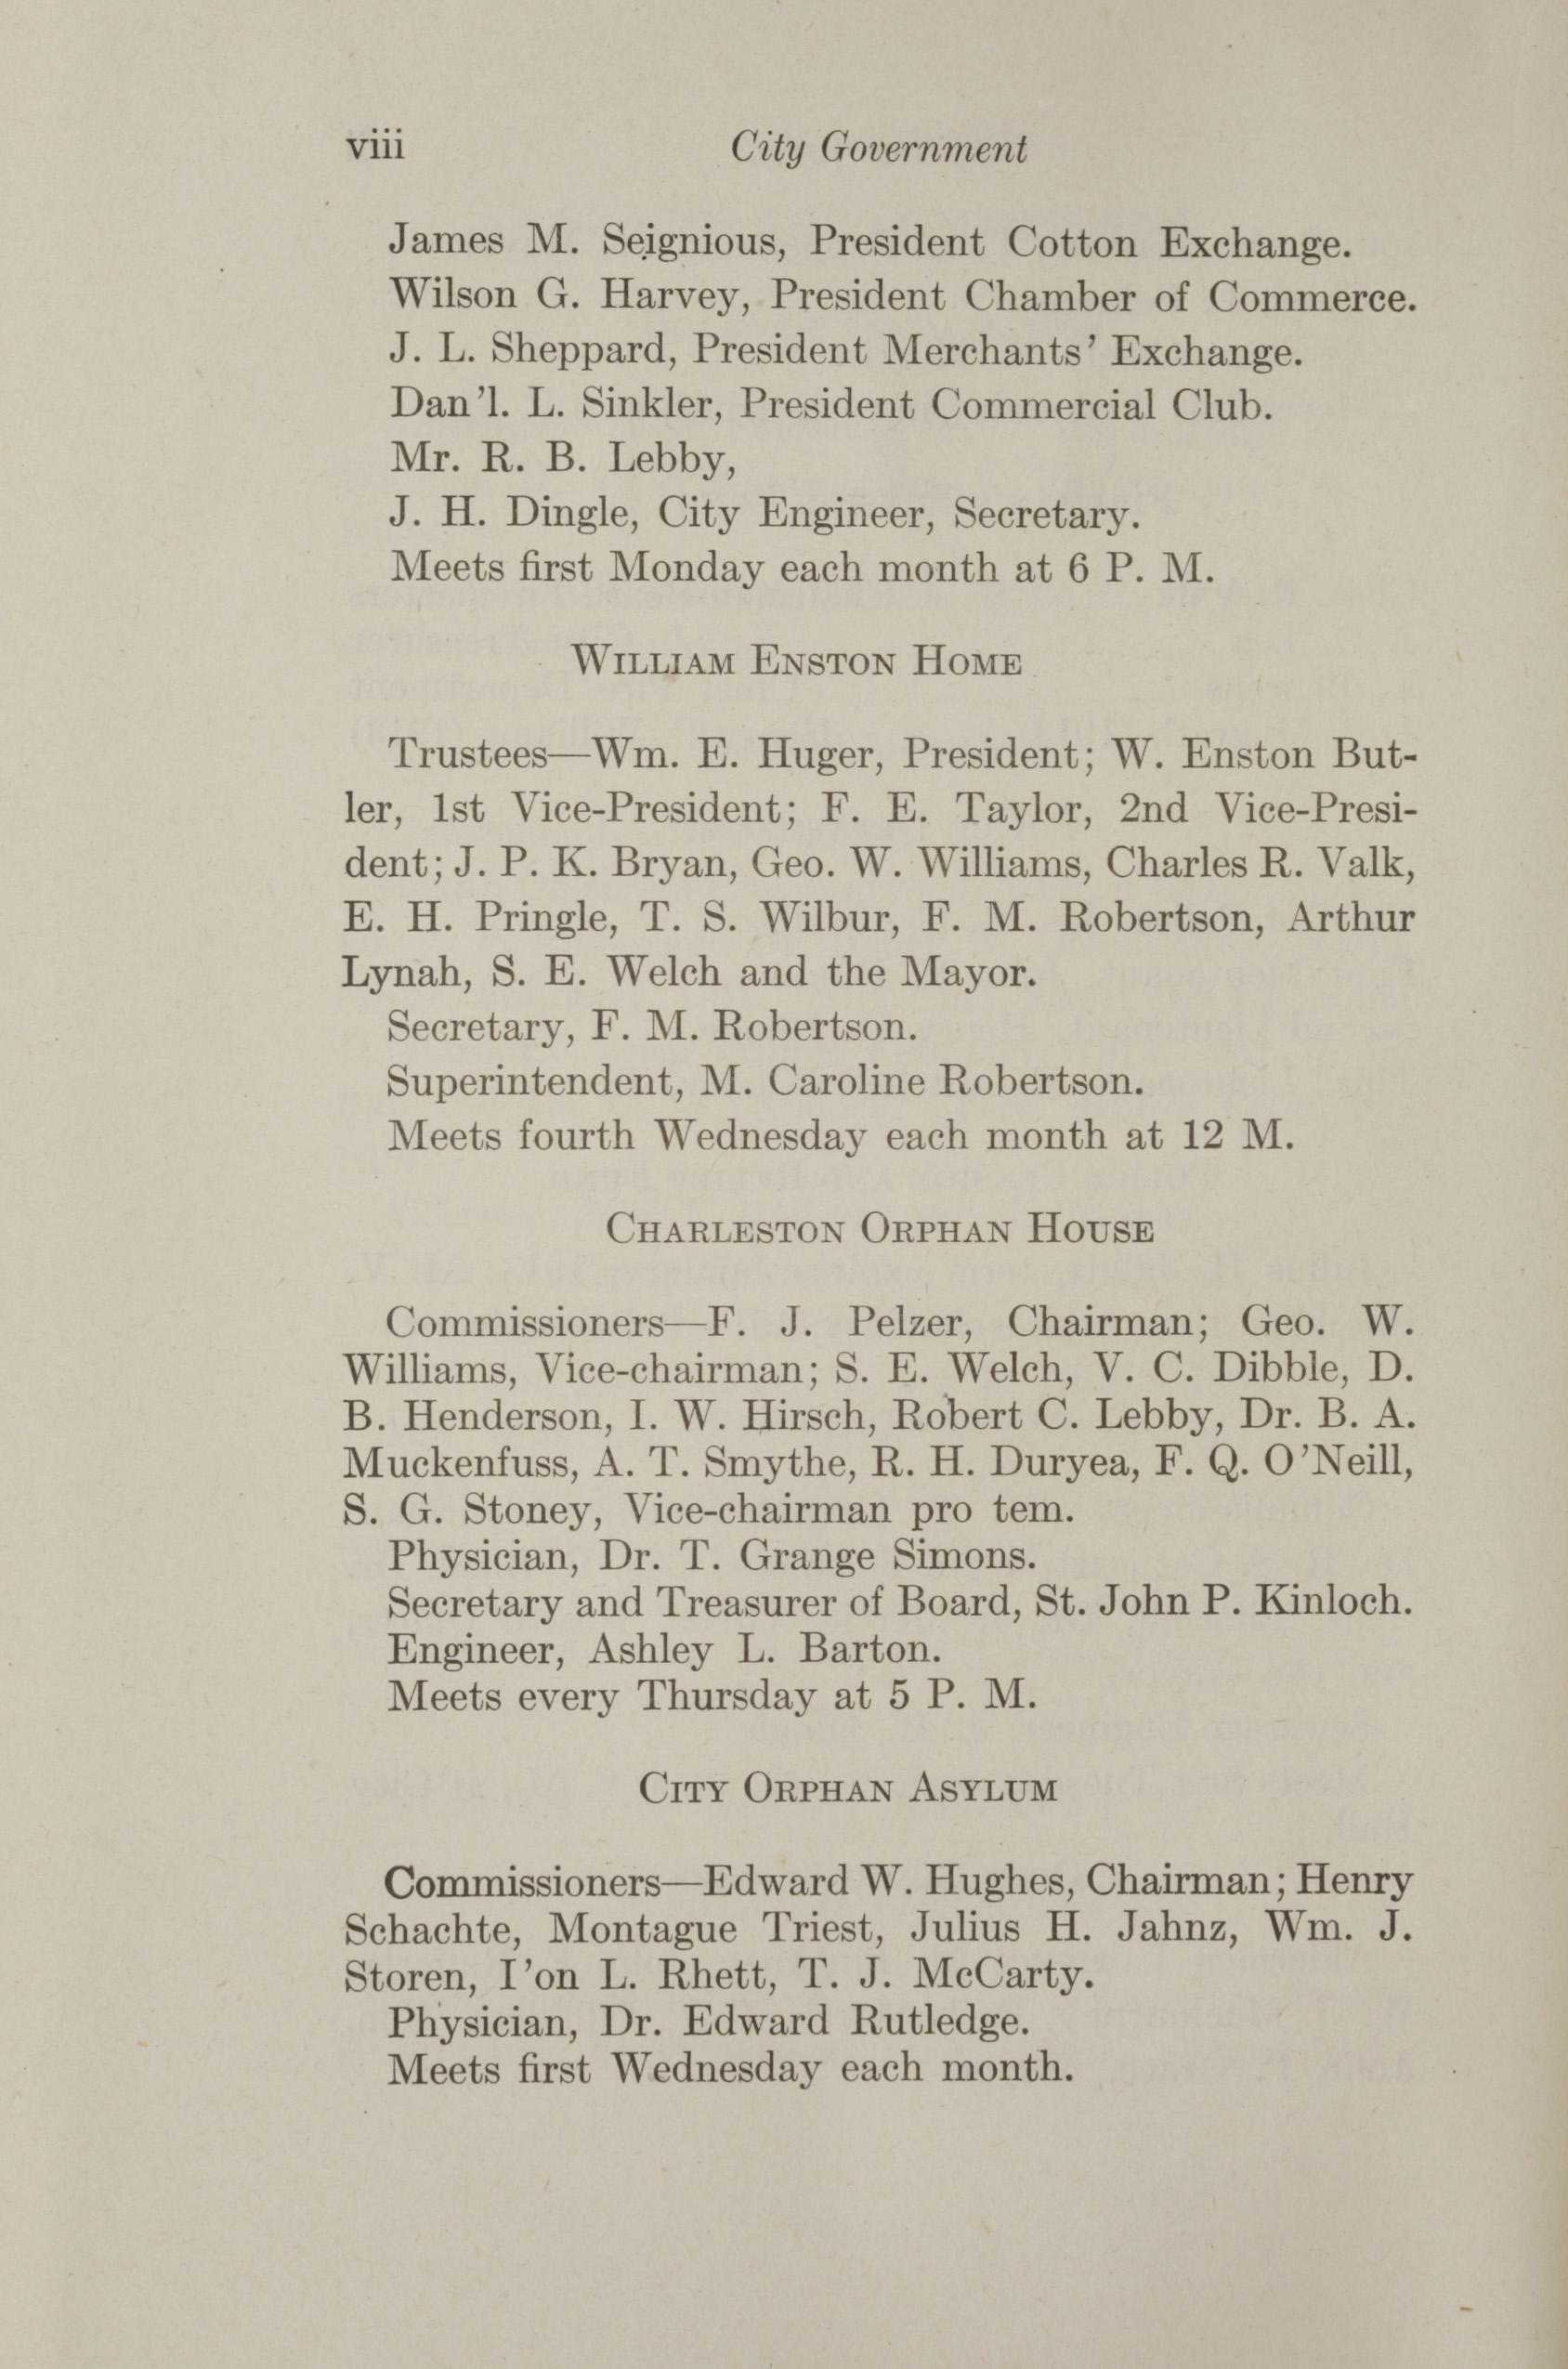 Charleston Yearbook, 1912, page viii